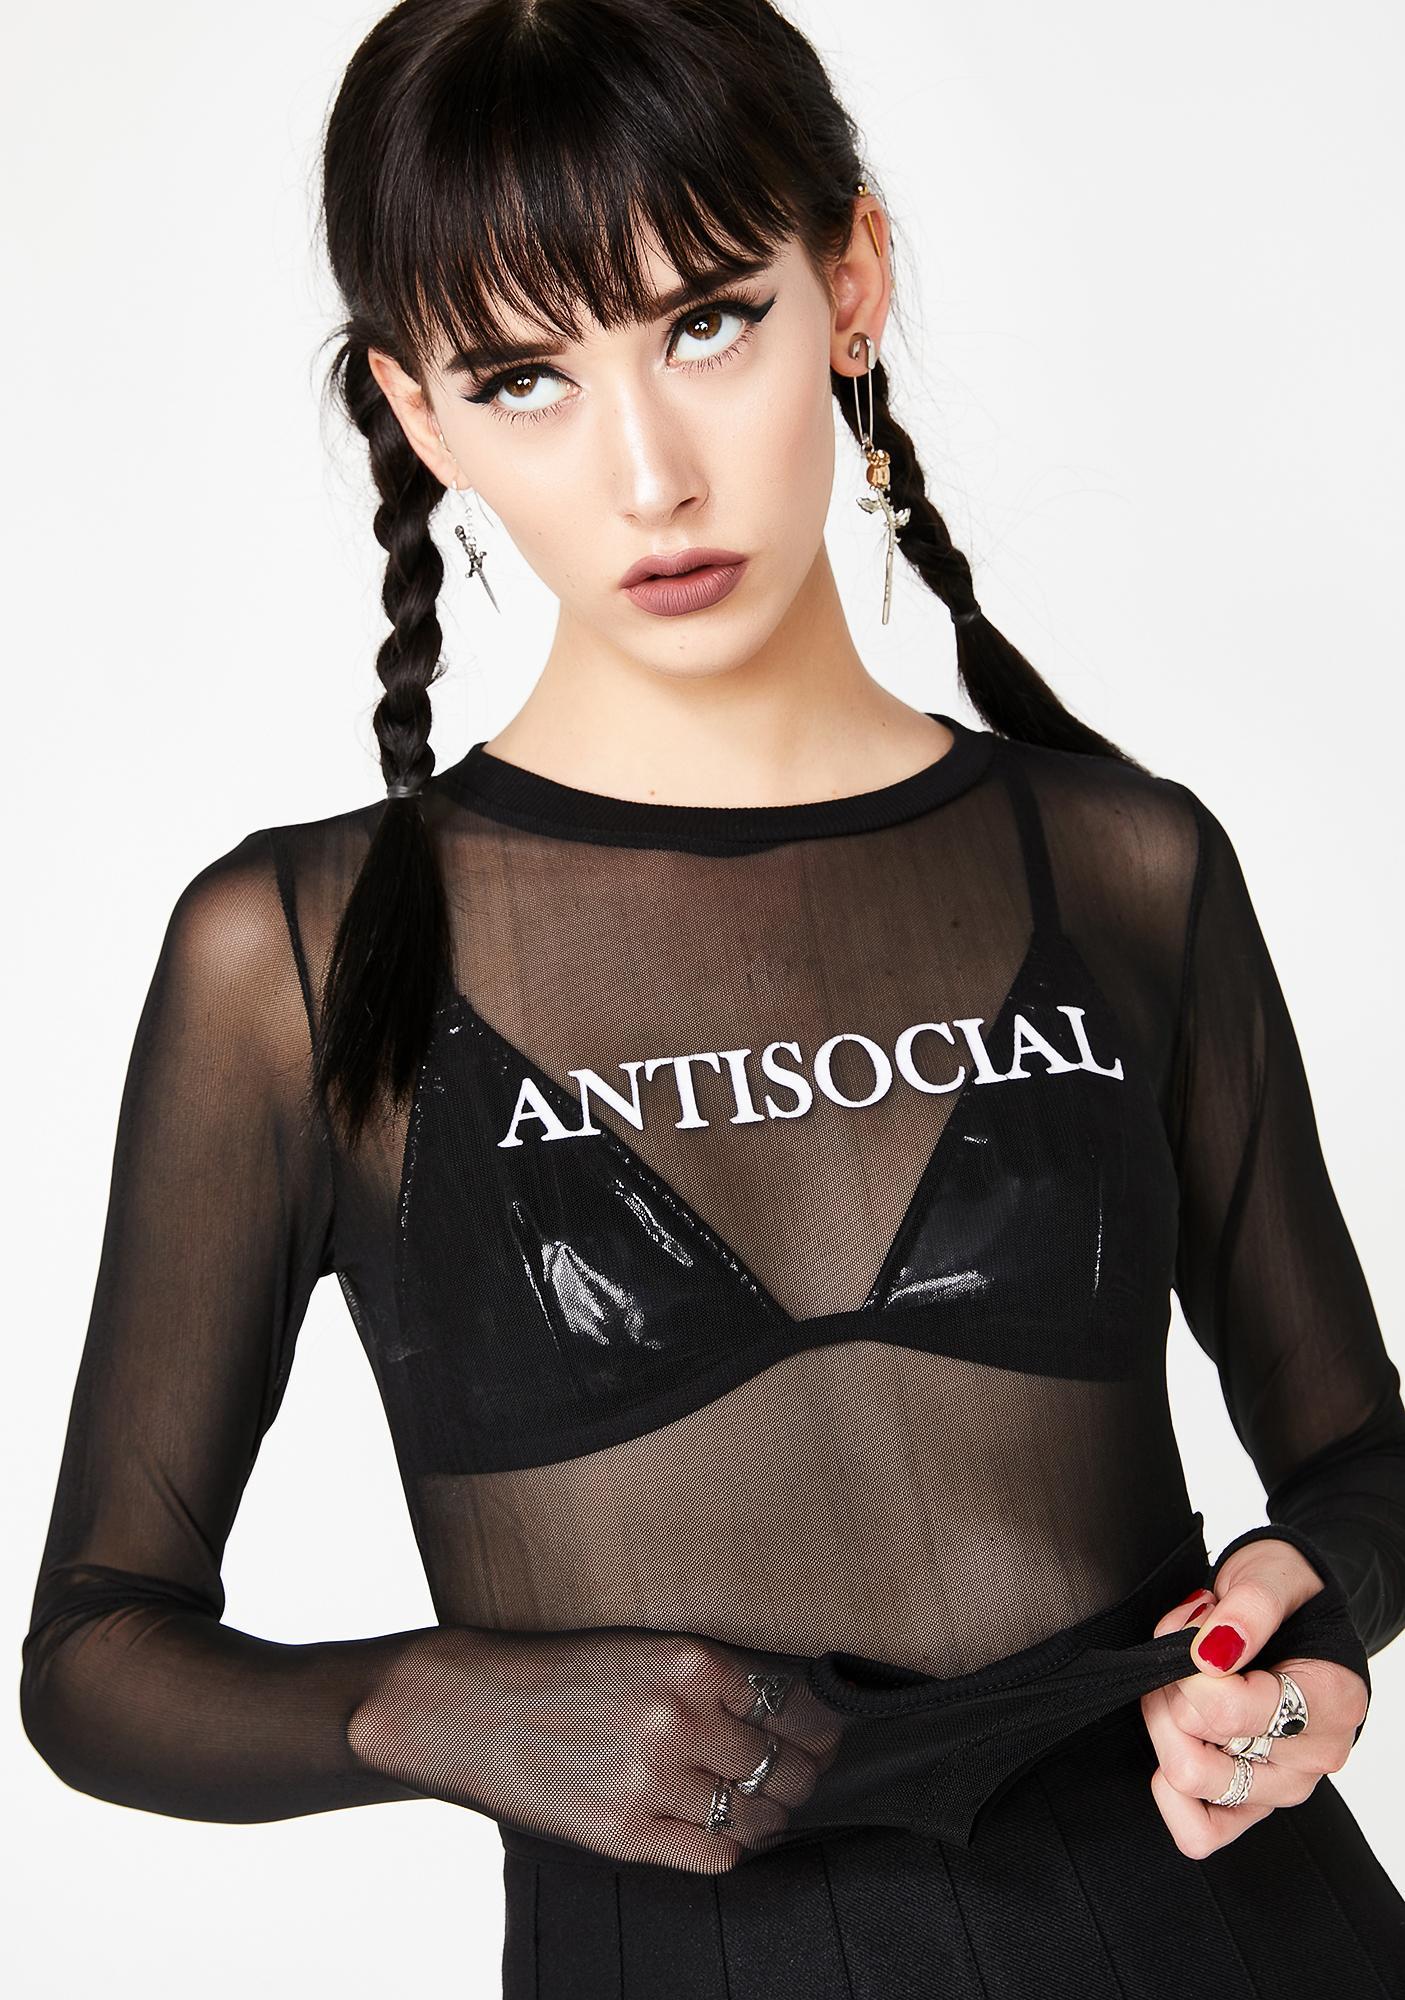 Widow Antisocial Mesh Long Sleeve Tee